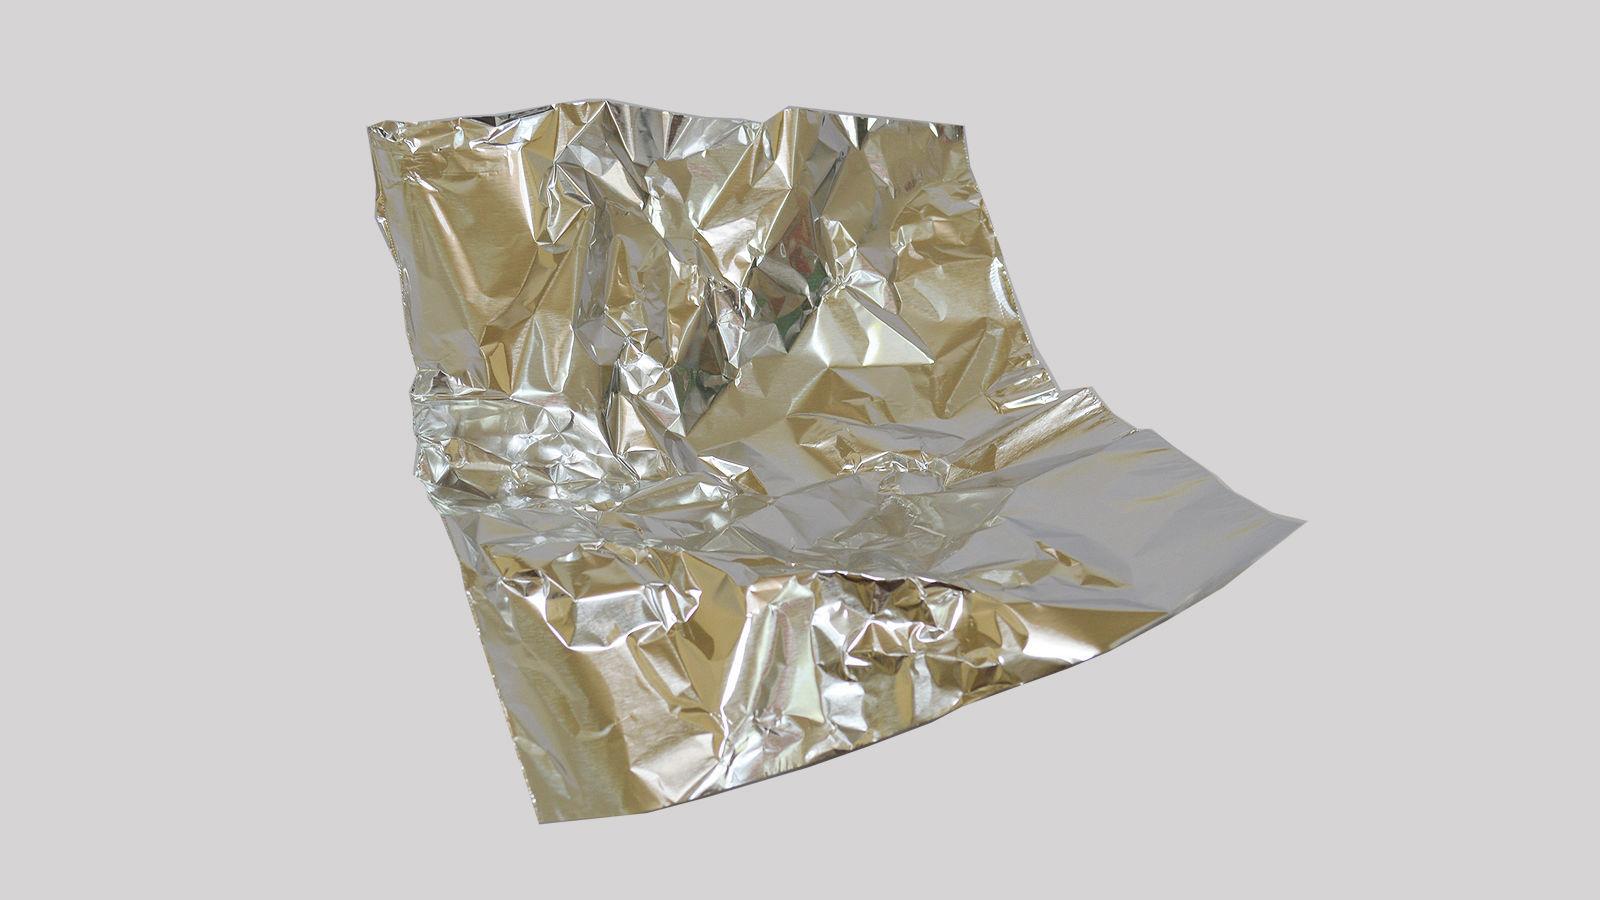 Yliquor Round Shaped Clear Hard Plastic 7 Day Drug Organizer Case